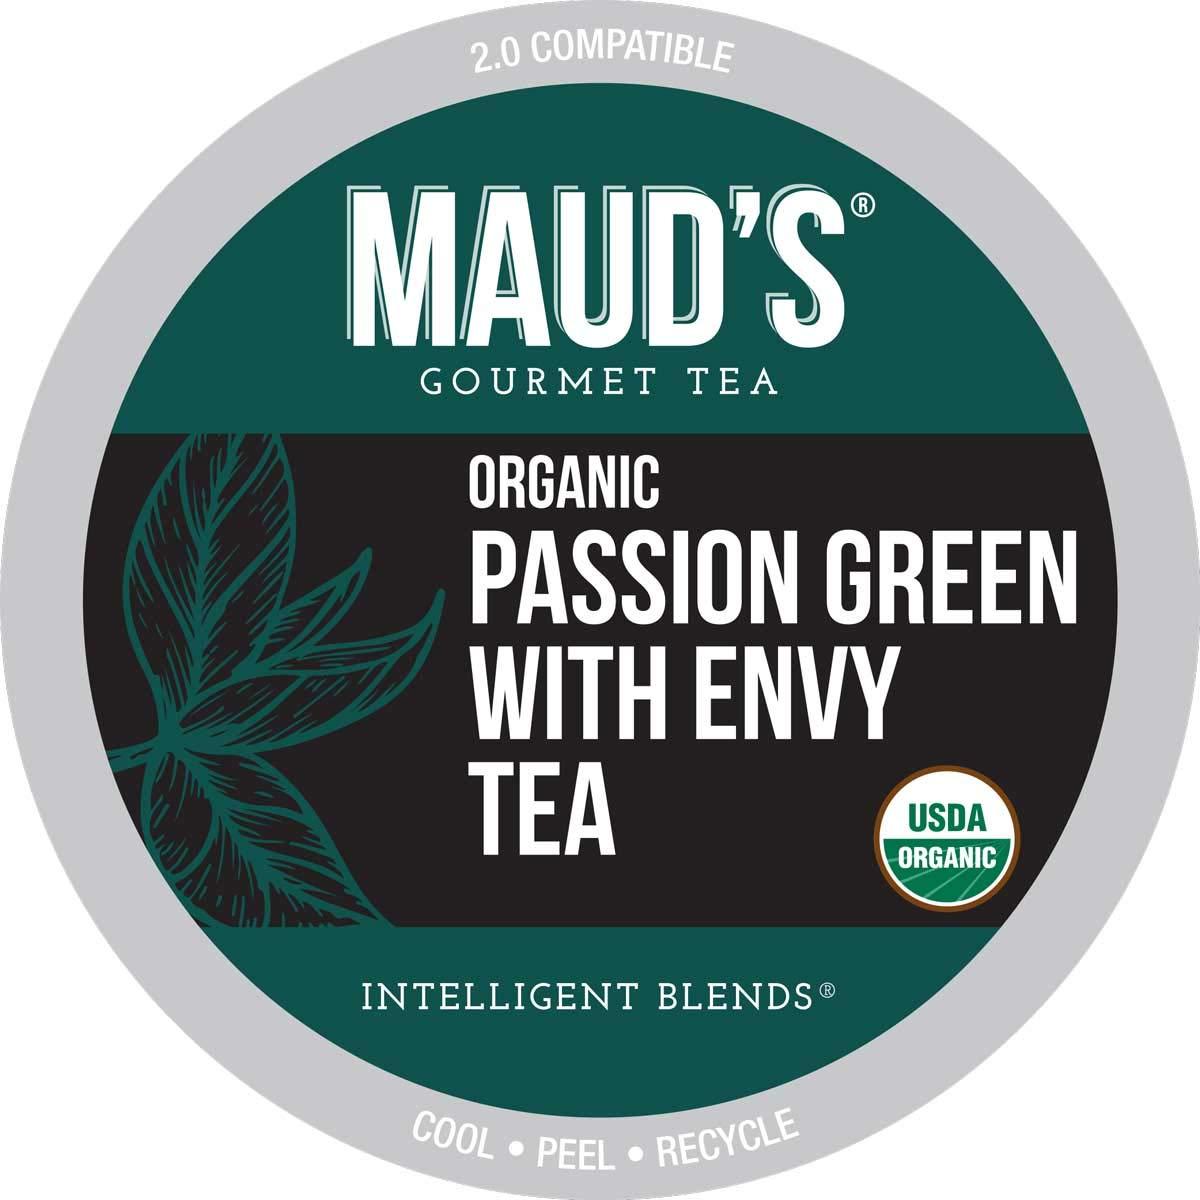 Maud's Organic Green Tea Passion (Passion Green Envy Tea), 24ct. Recyclable Single Serve Organic Green Tea Pods – 100% Organic Passion Green Tea California Blended, Keurig Green Tea K Cup Compatible